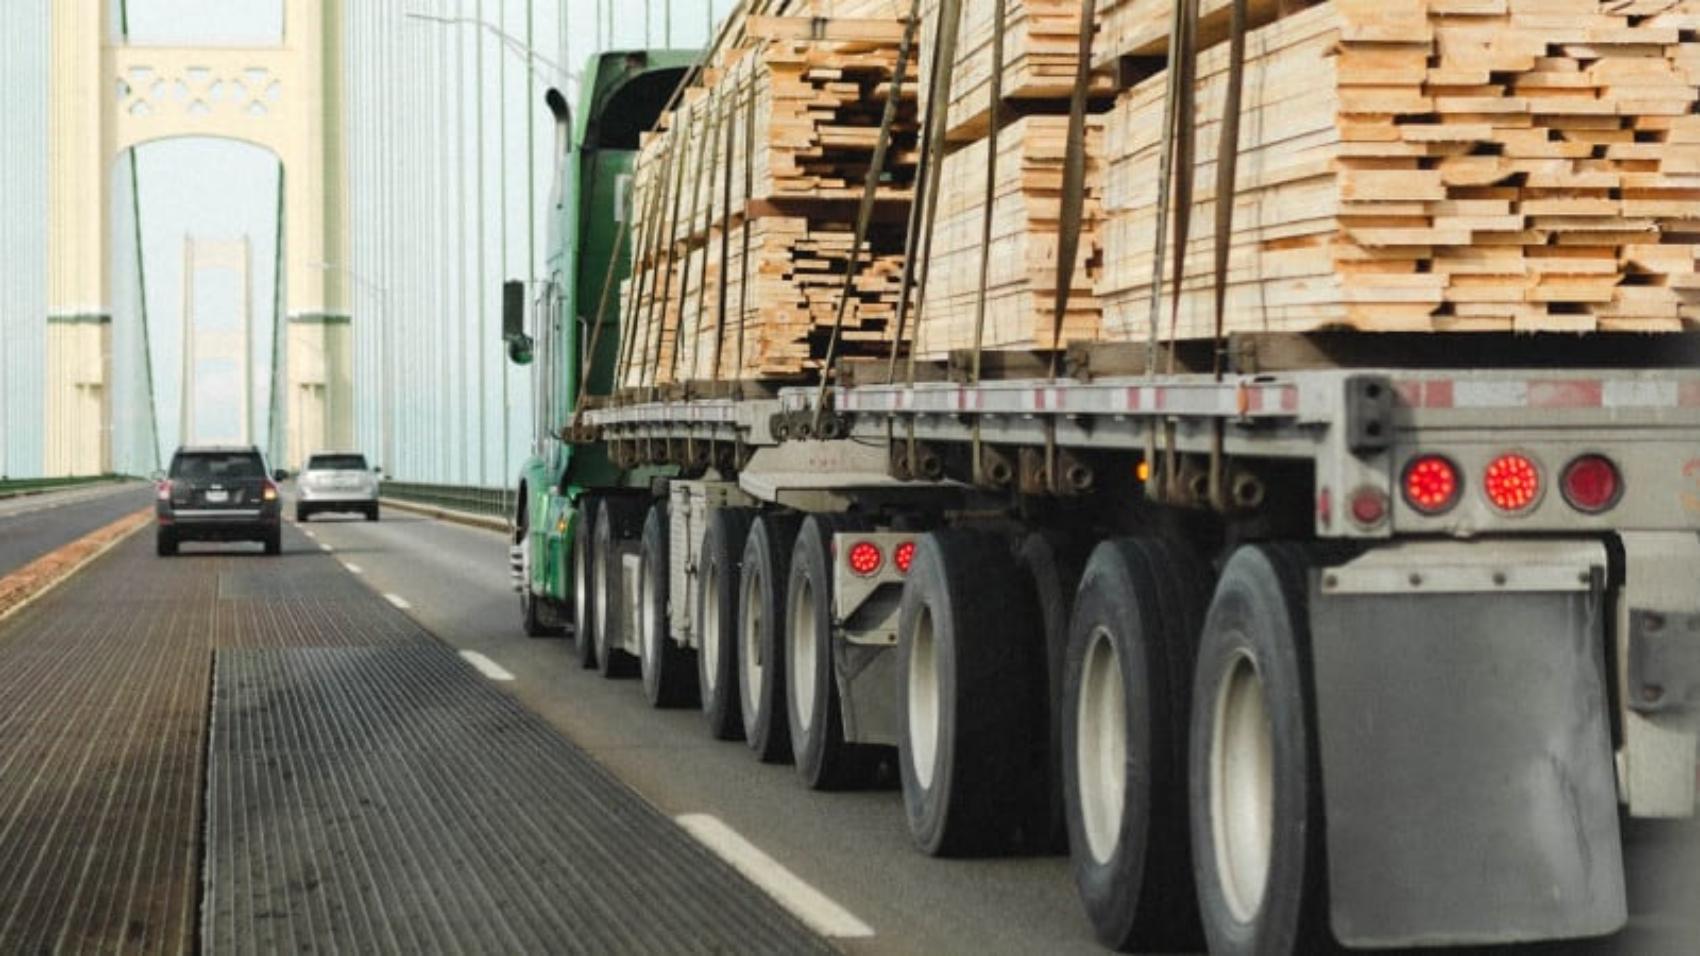 medidas-de-seguranca-no-transporte-de-cargas